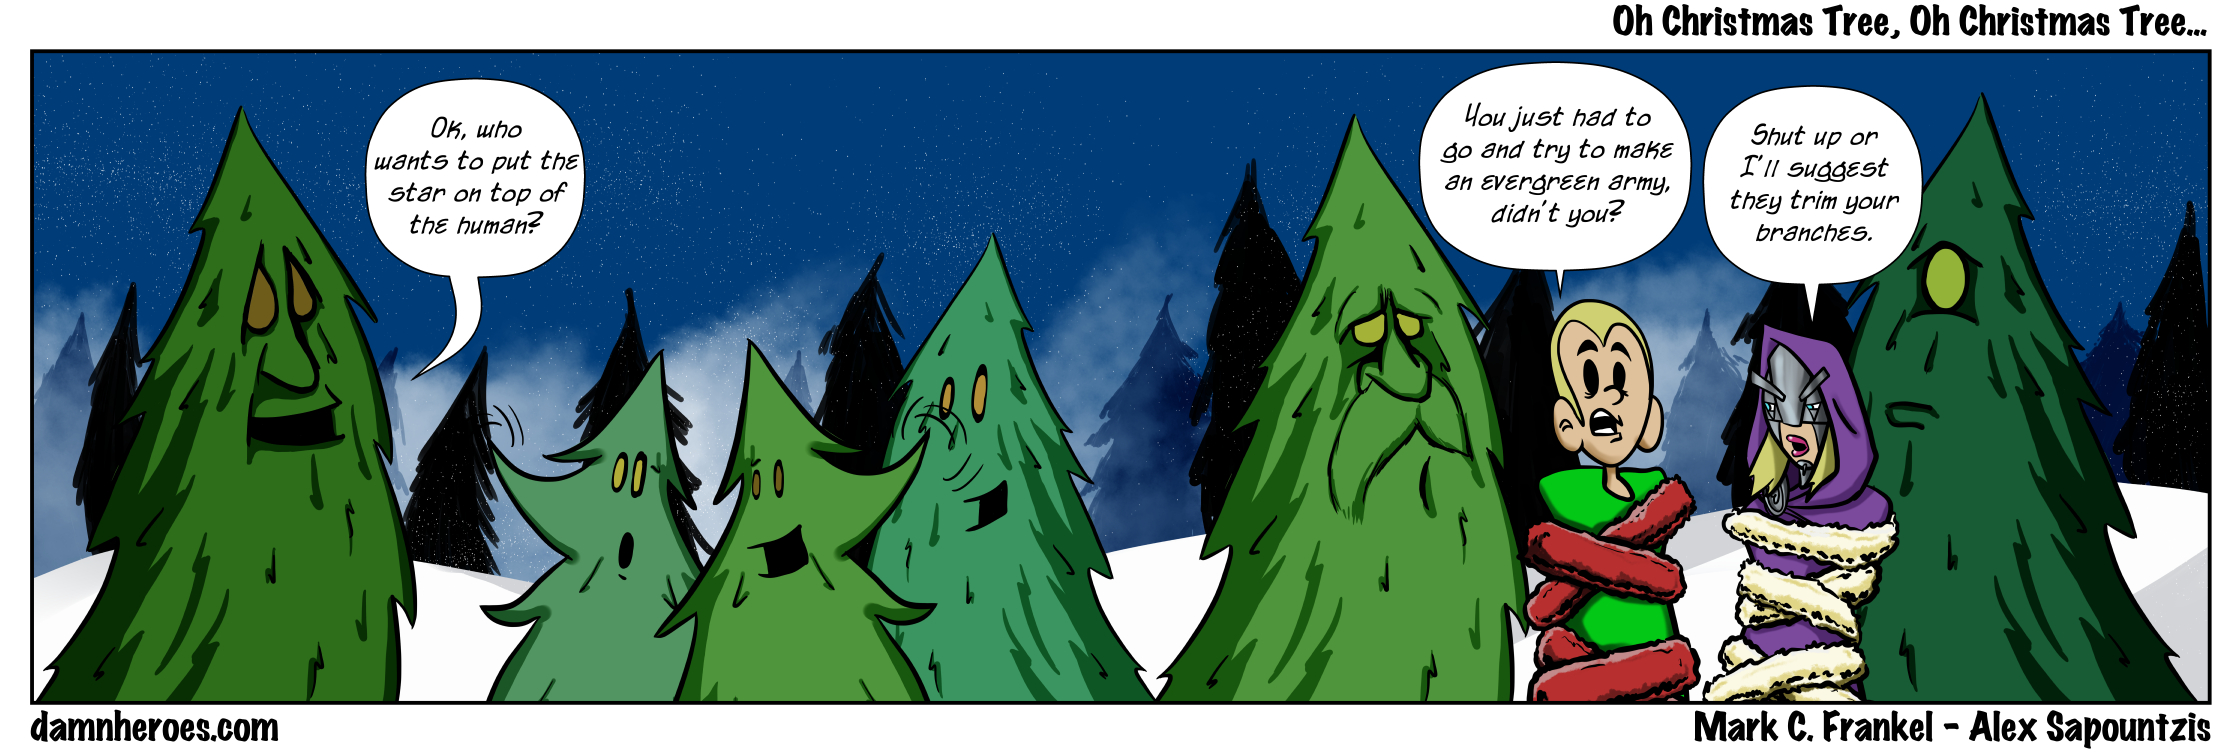 Oh Christmas Tree, Oh Christmas Tree…